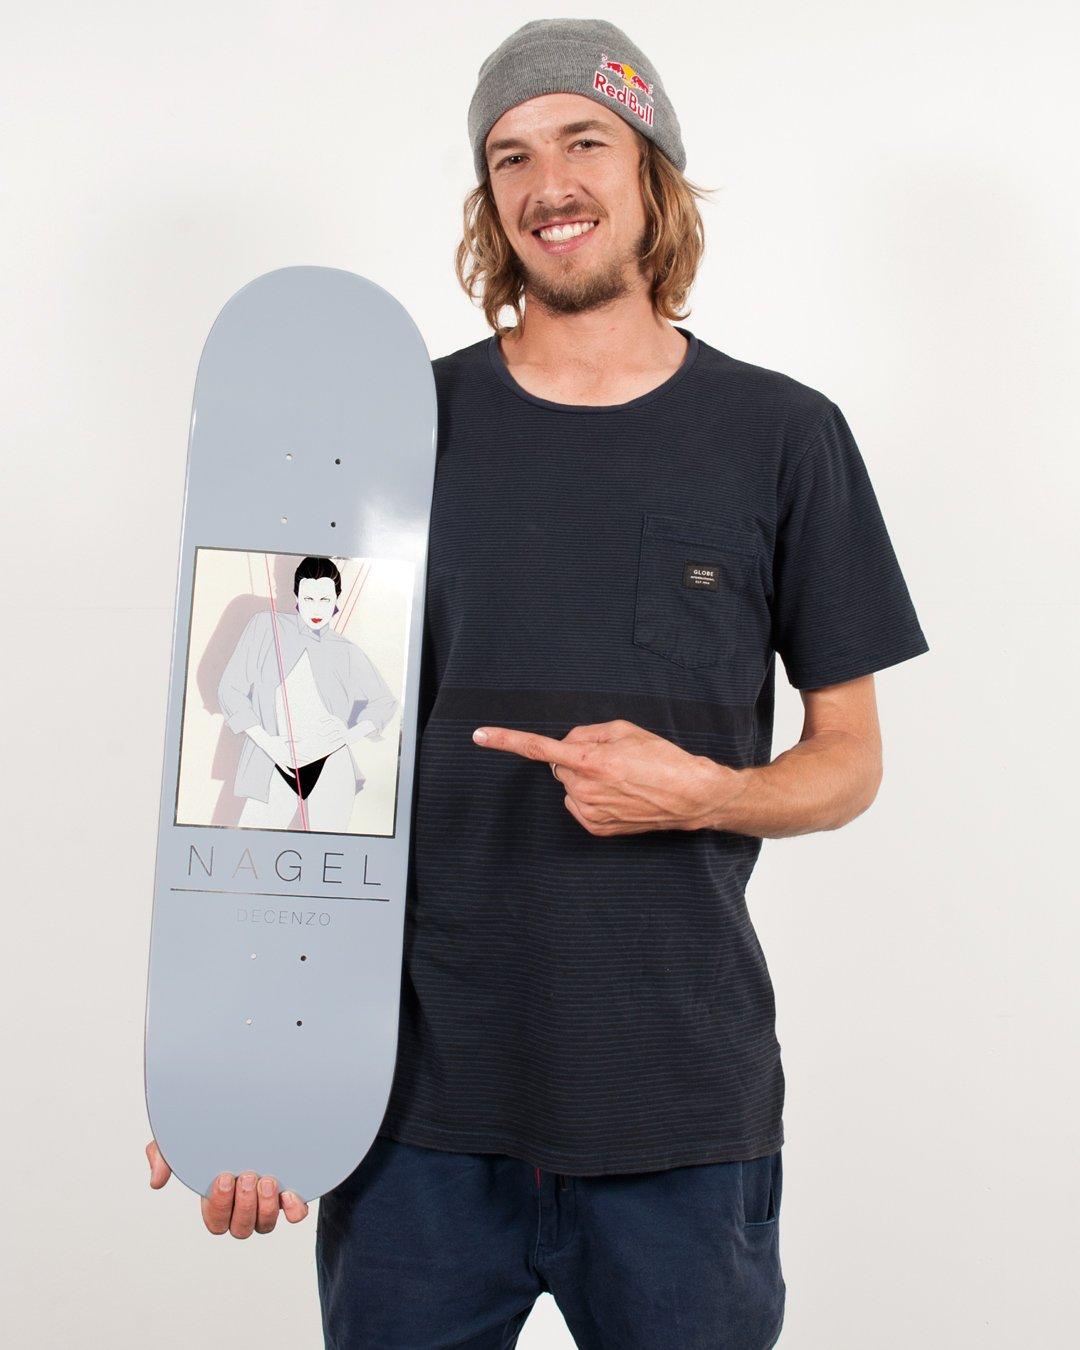 Nagel Darkstar Skateboards 4